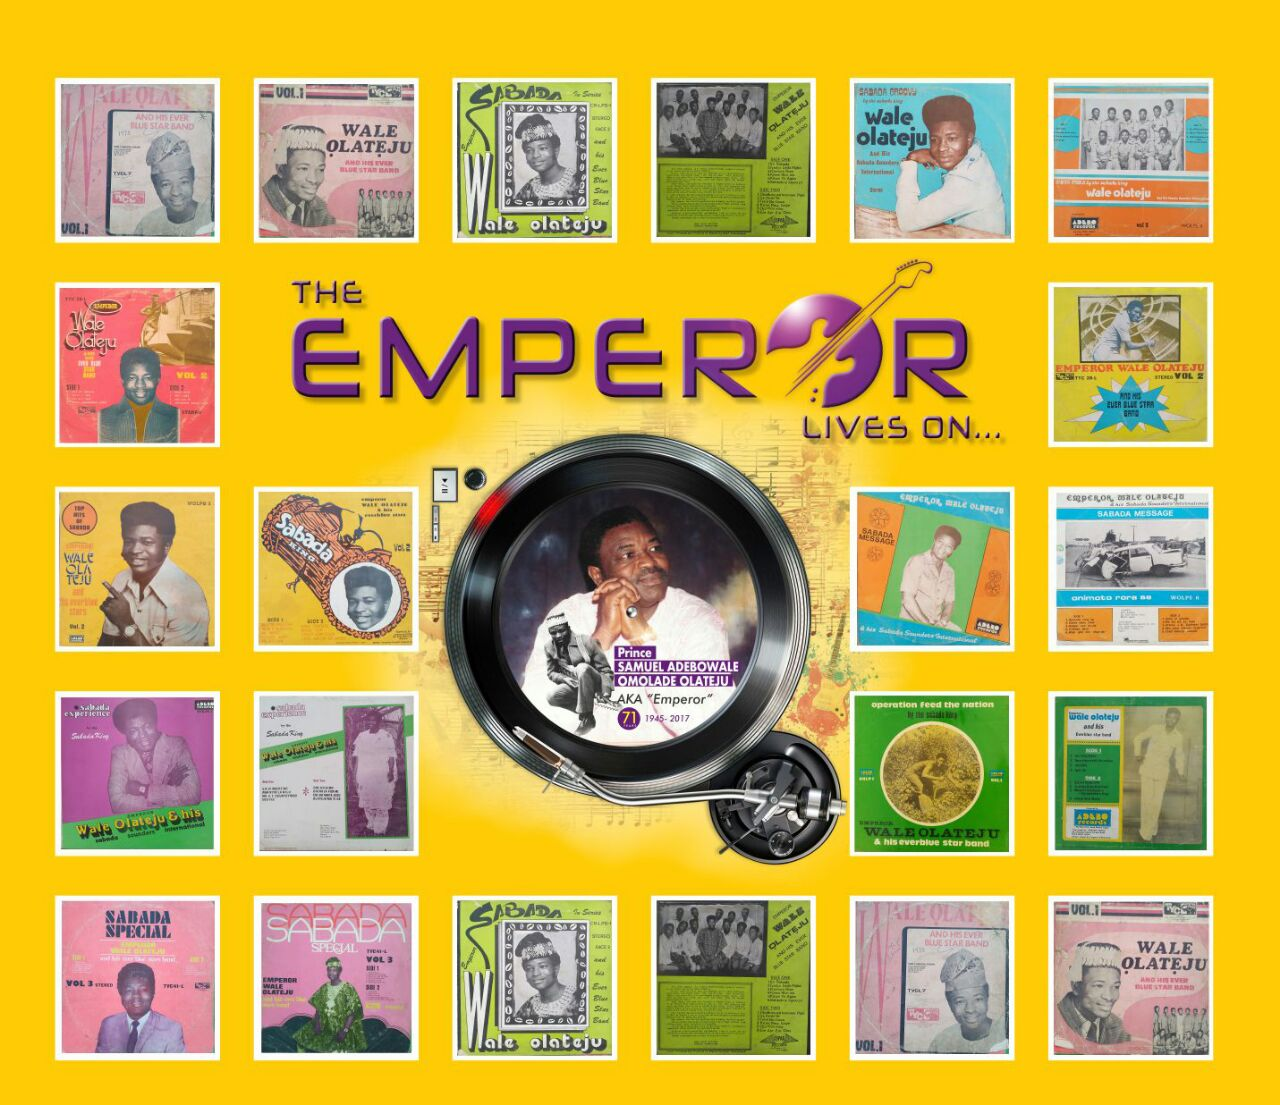 Remembering Emperor; theSabadamaestro